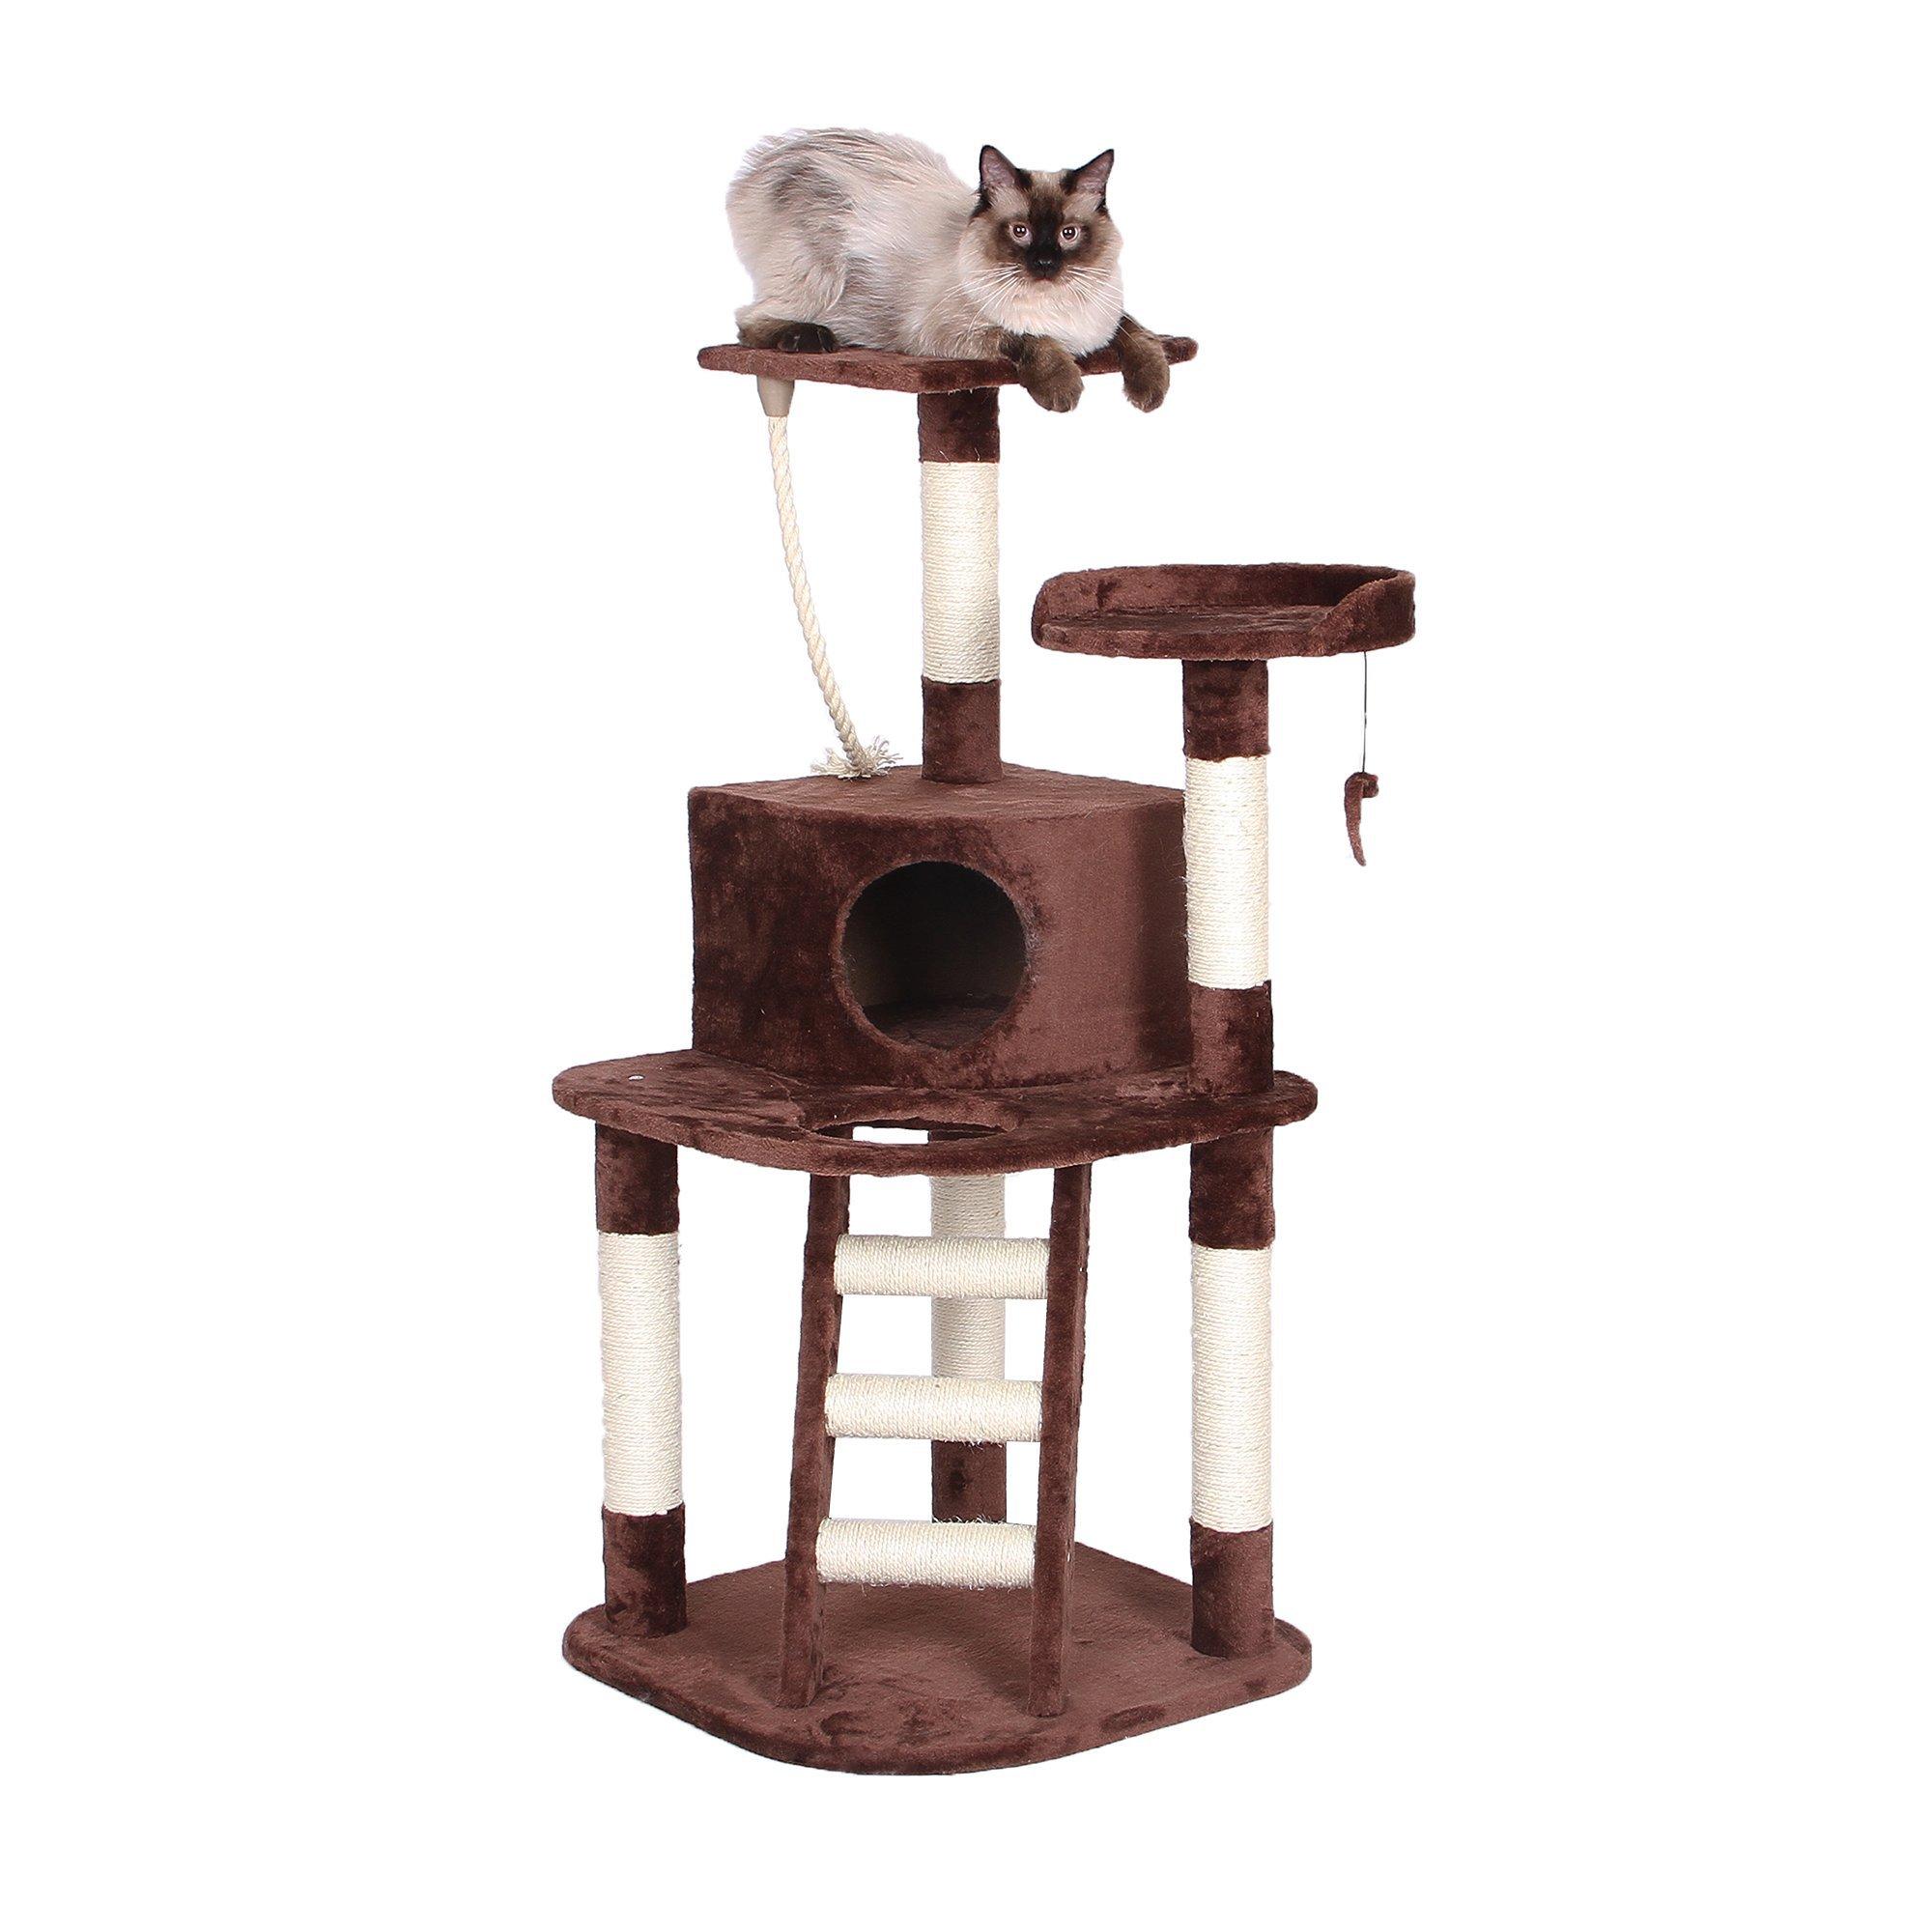 Catry Cat Tree Condo, 20'' L x 20'' W x 47'' H, Chocolate